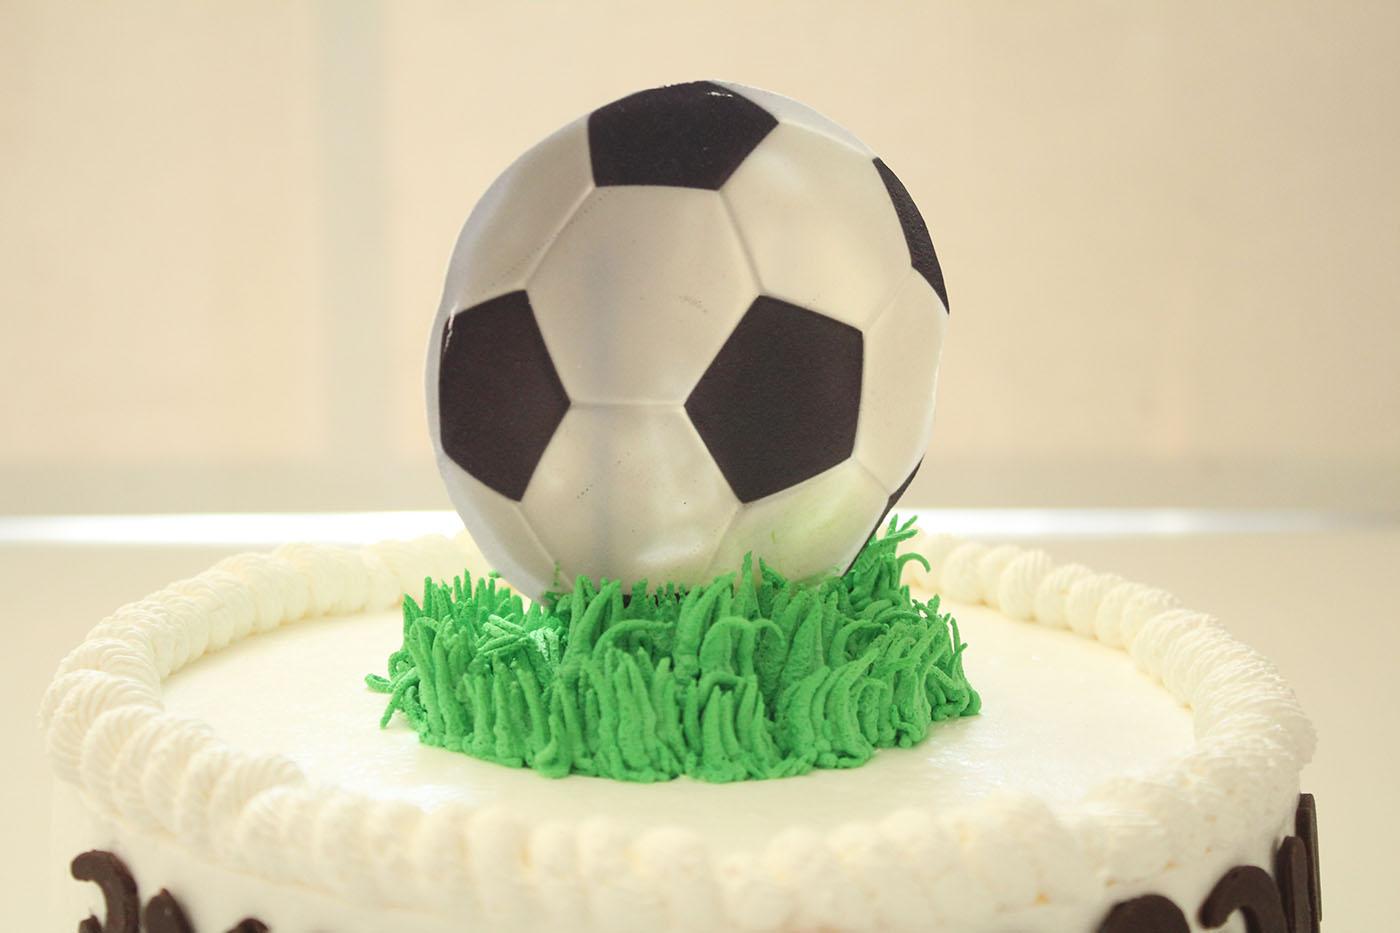 IMG 9390 - עוגת זילוף